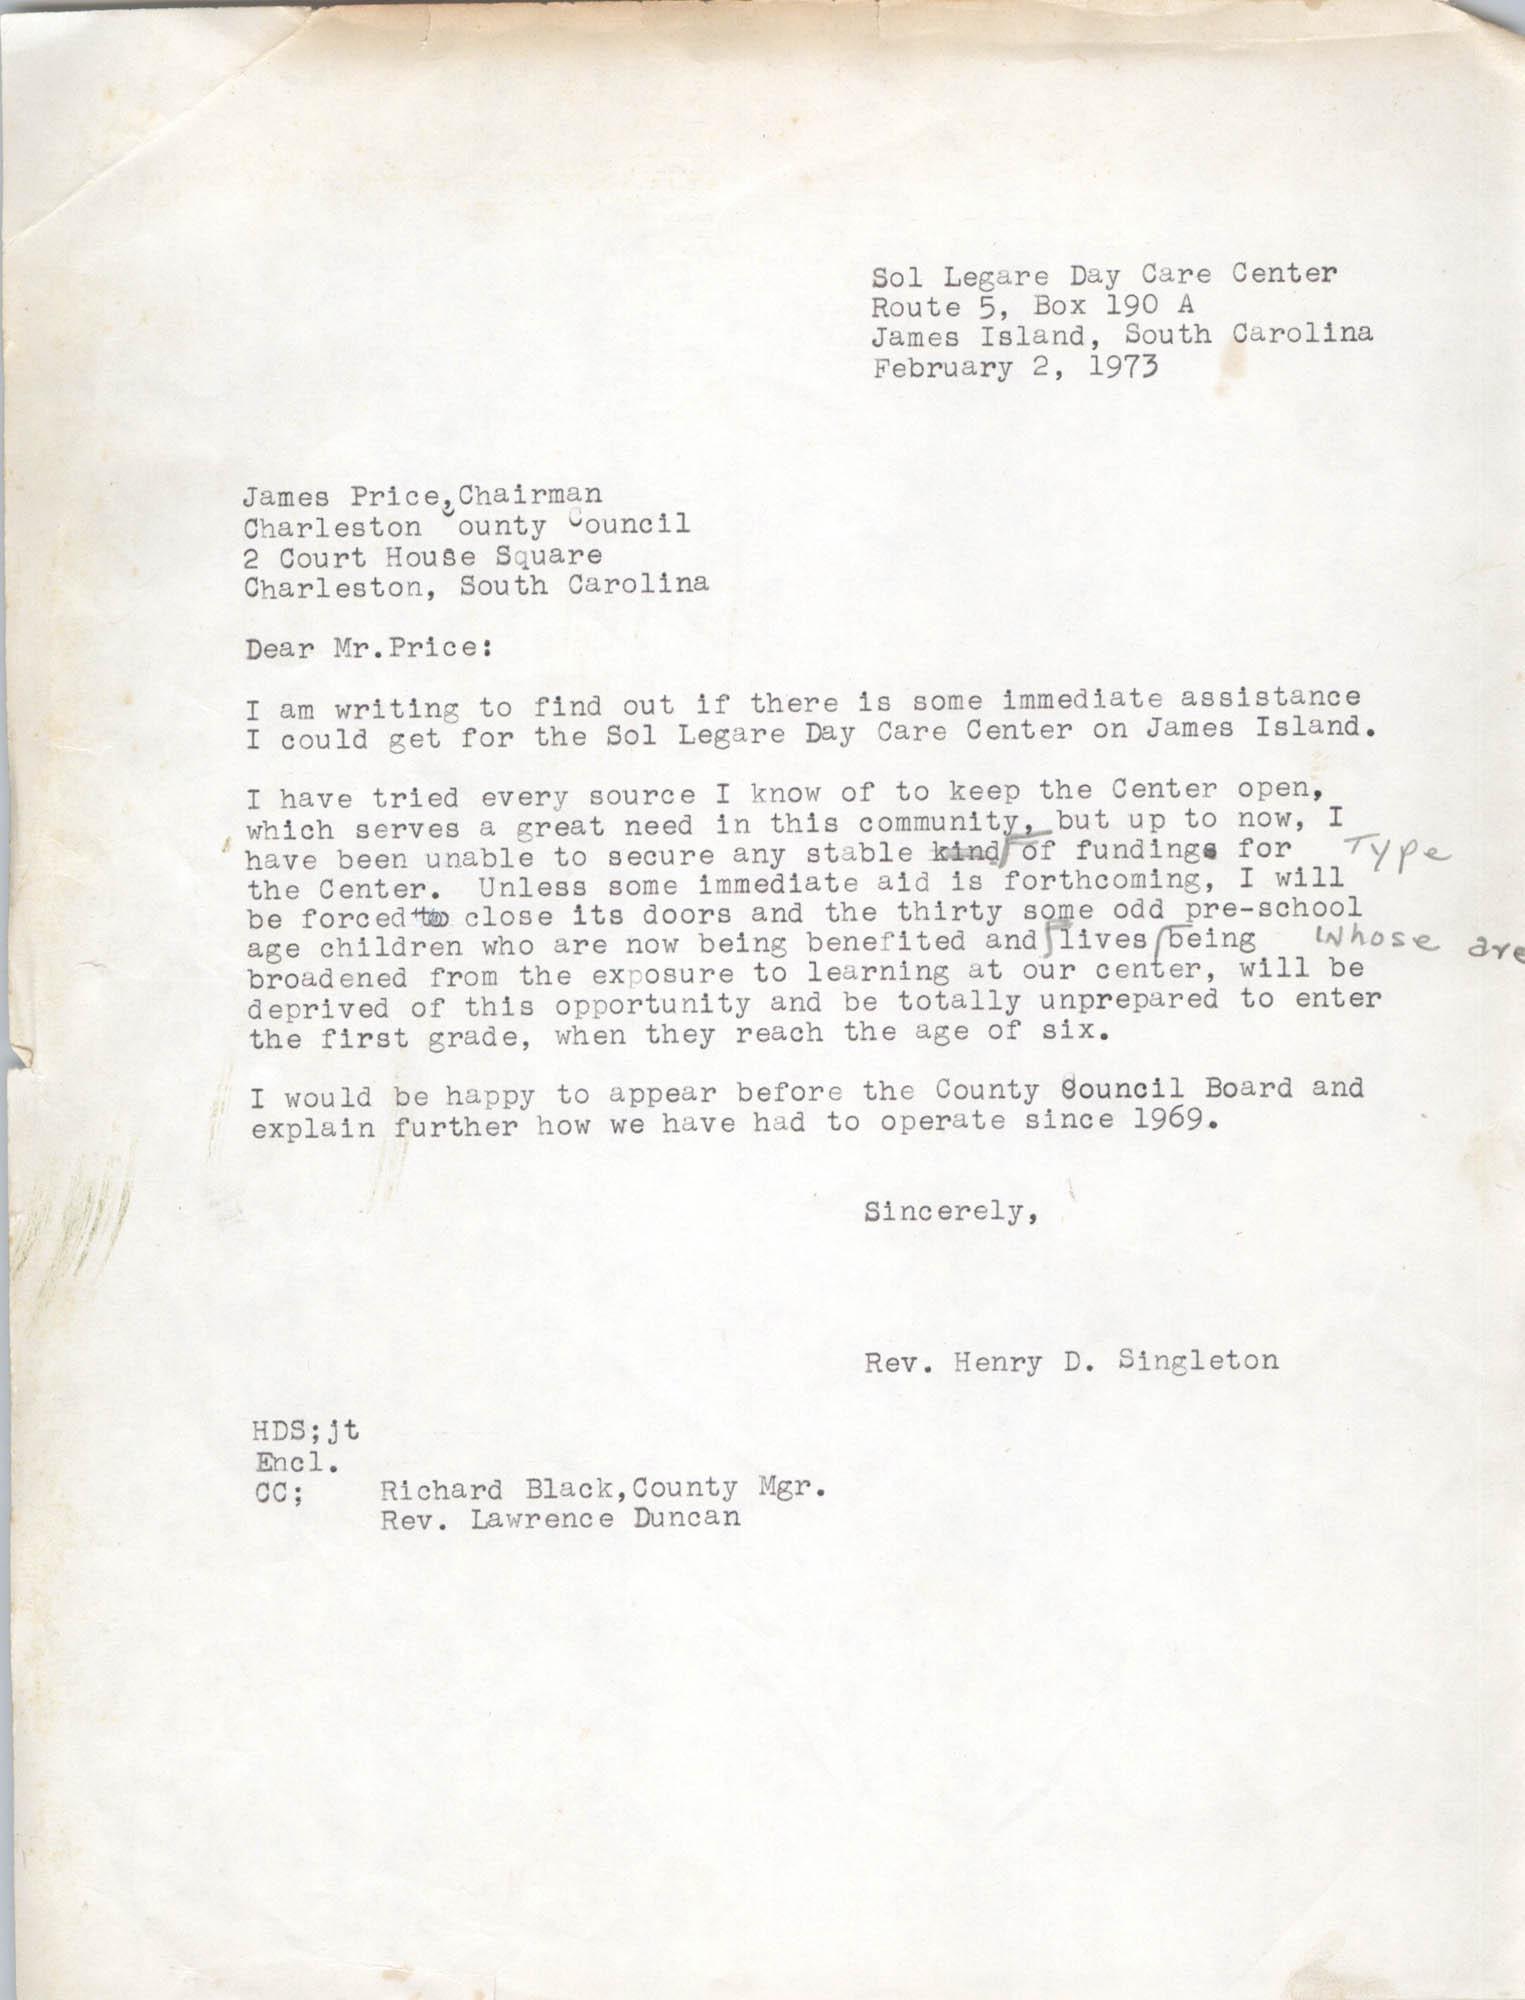 Letter from Henry D. Singleton to James Price, February 2, 1973